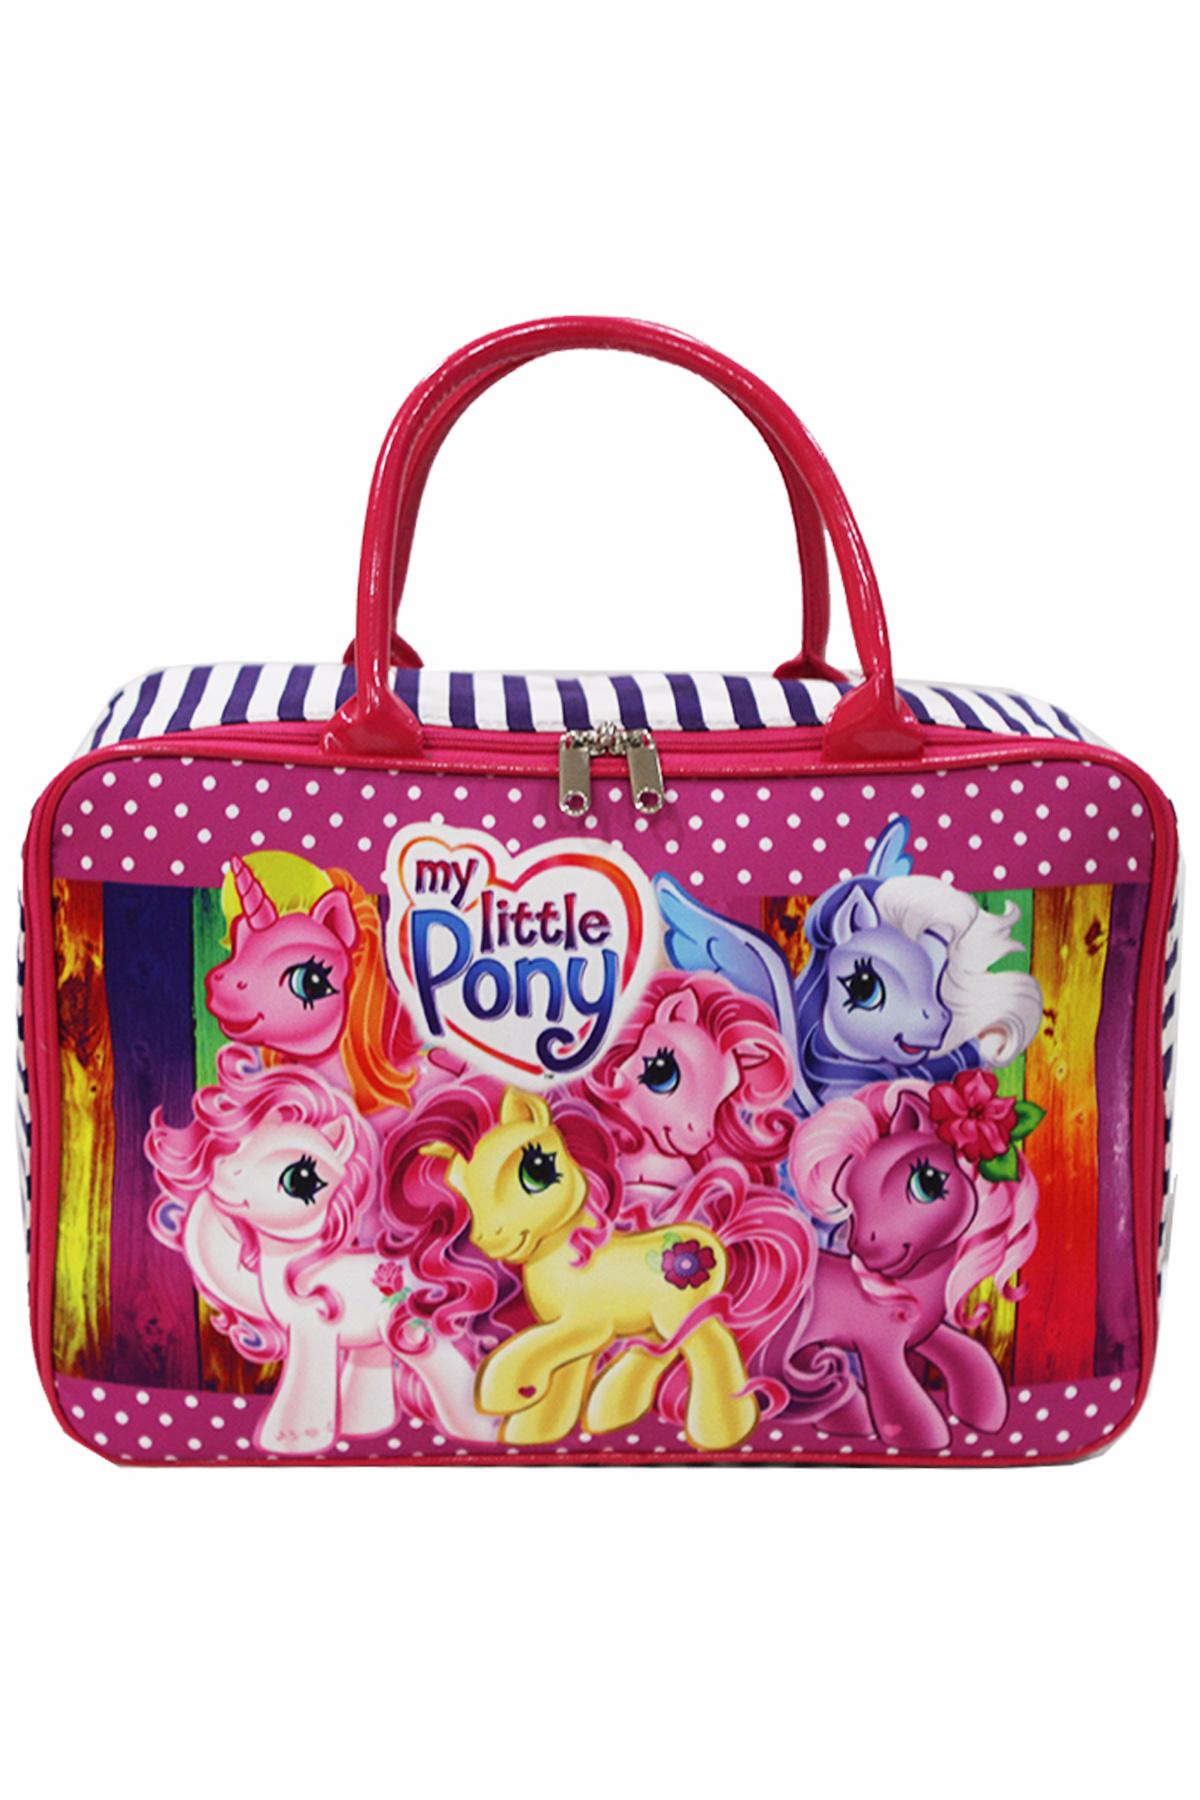 Travel Bag Anak Karakter Little Pony Bahan Kanvas - Pink